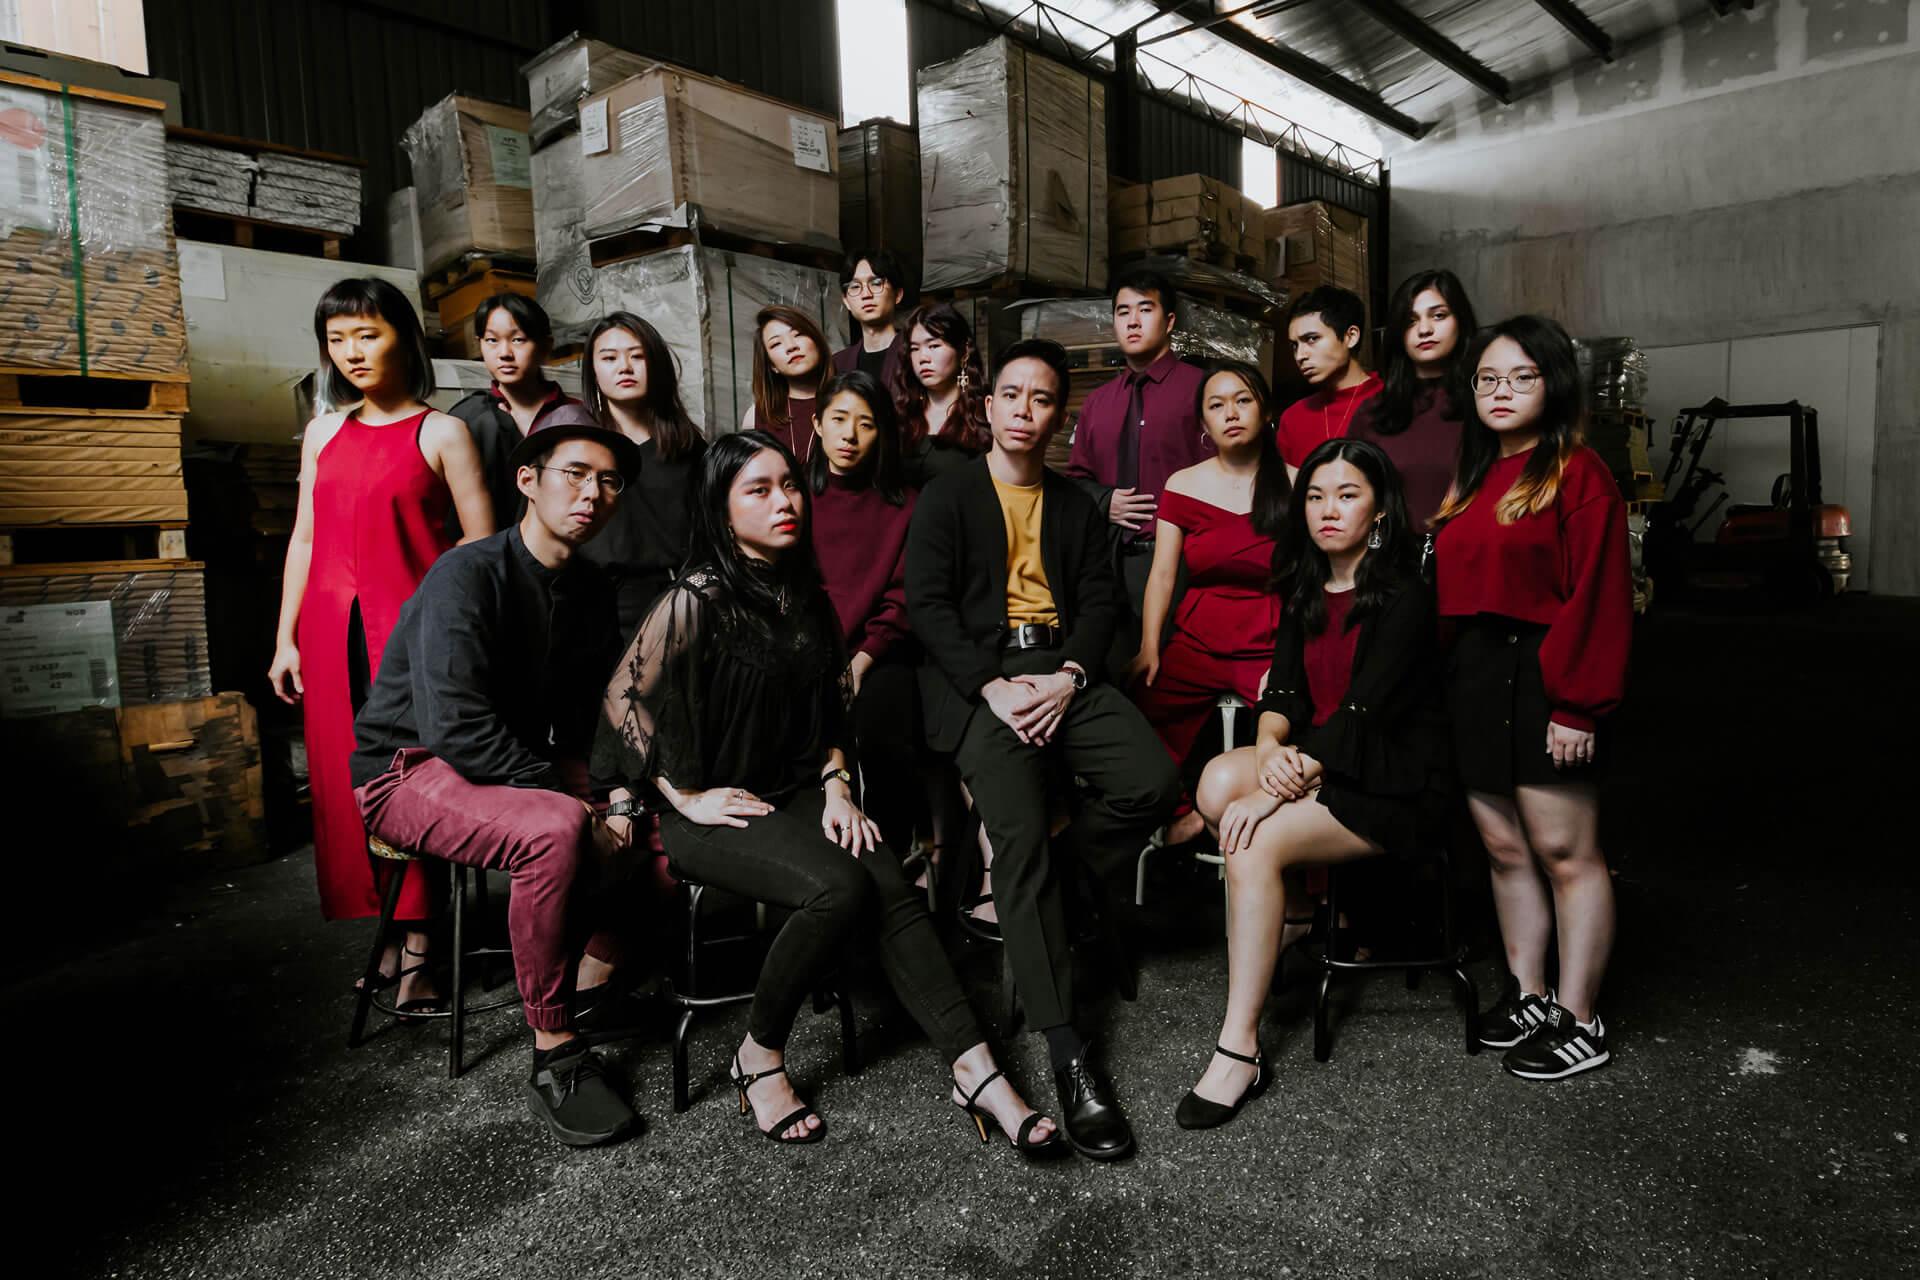 Studio20 Company